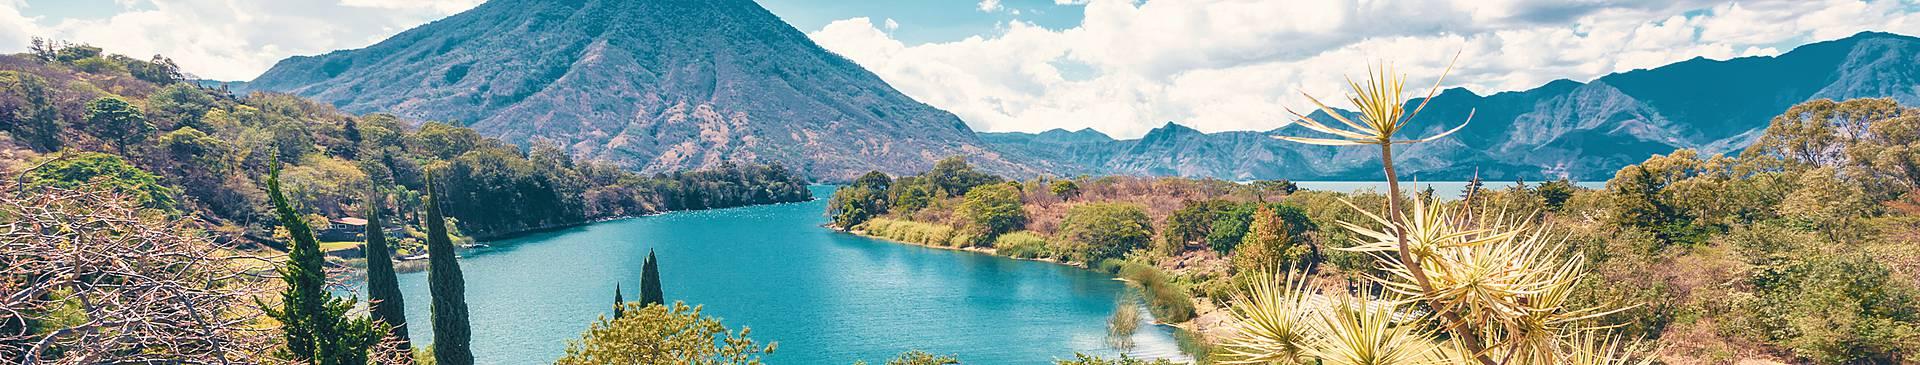 Summer in Guatemala